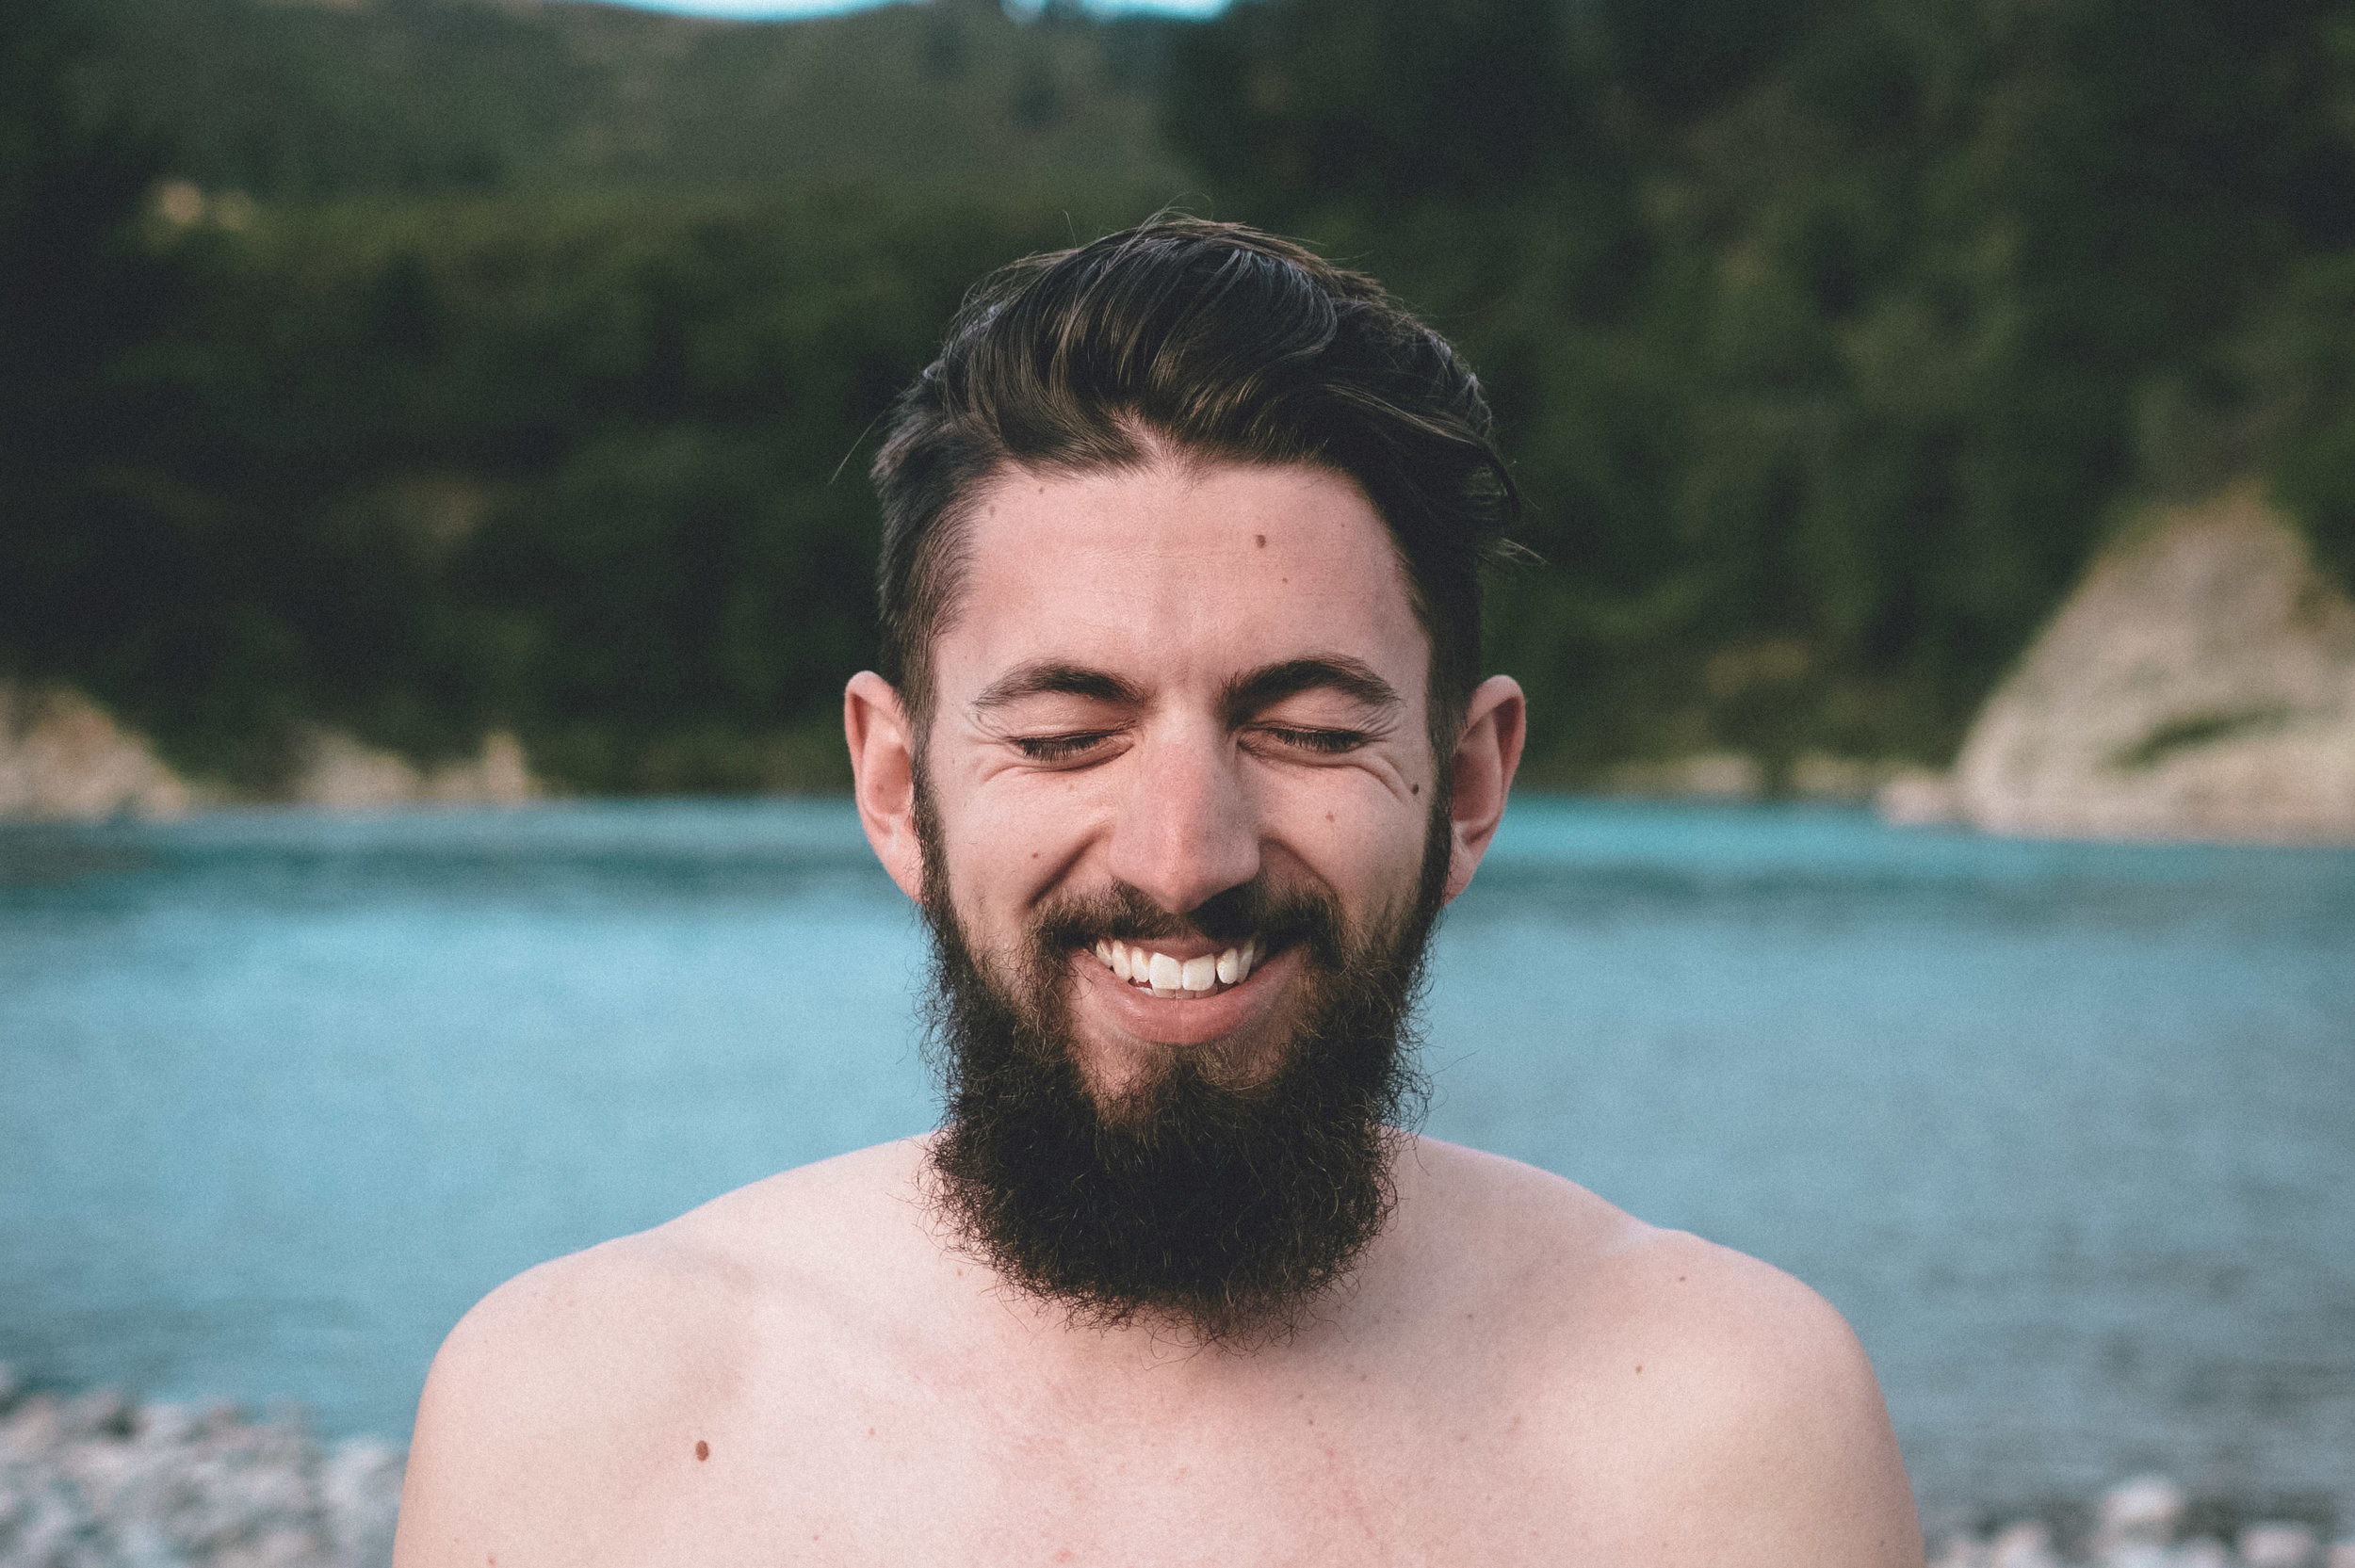 kingman_newzealand2-7.jpg